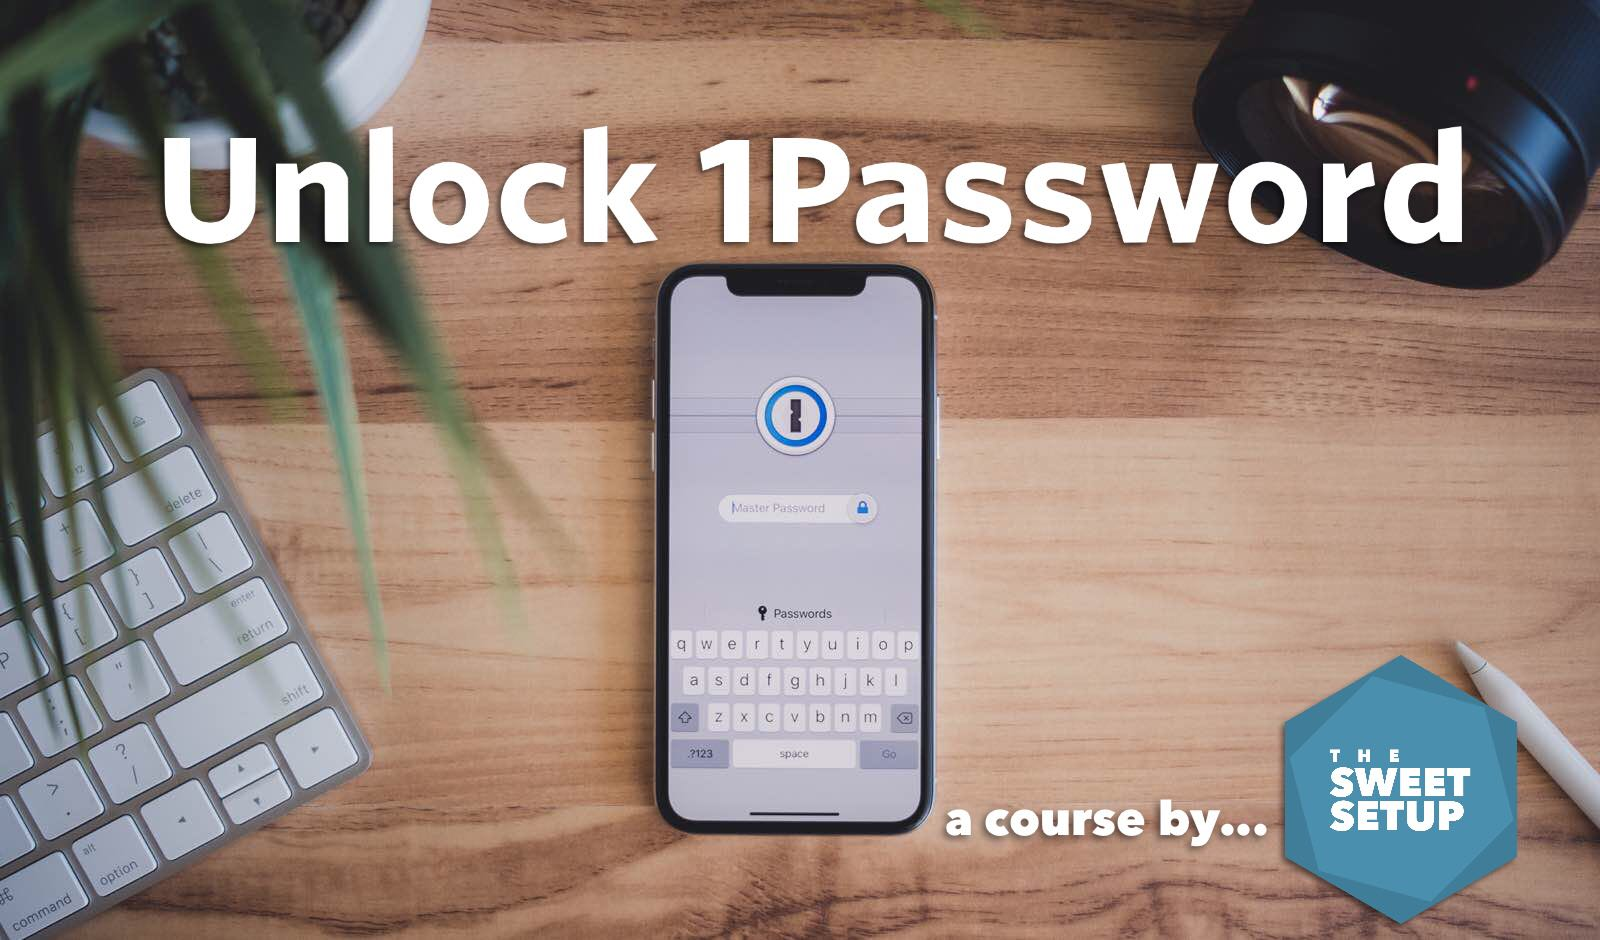 the-sweet-setup-unlock-1password-course